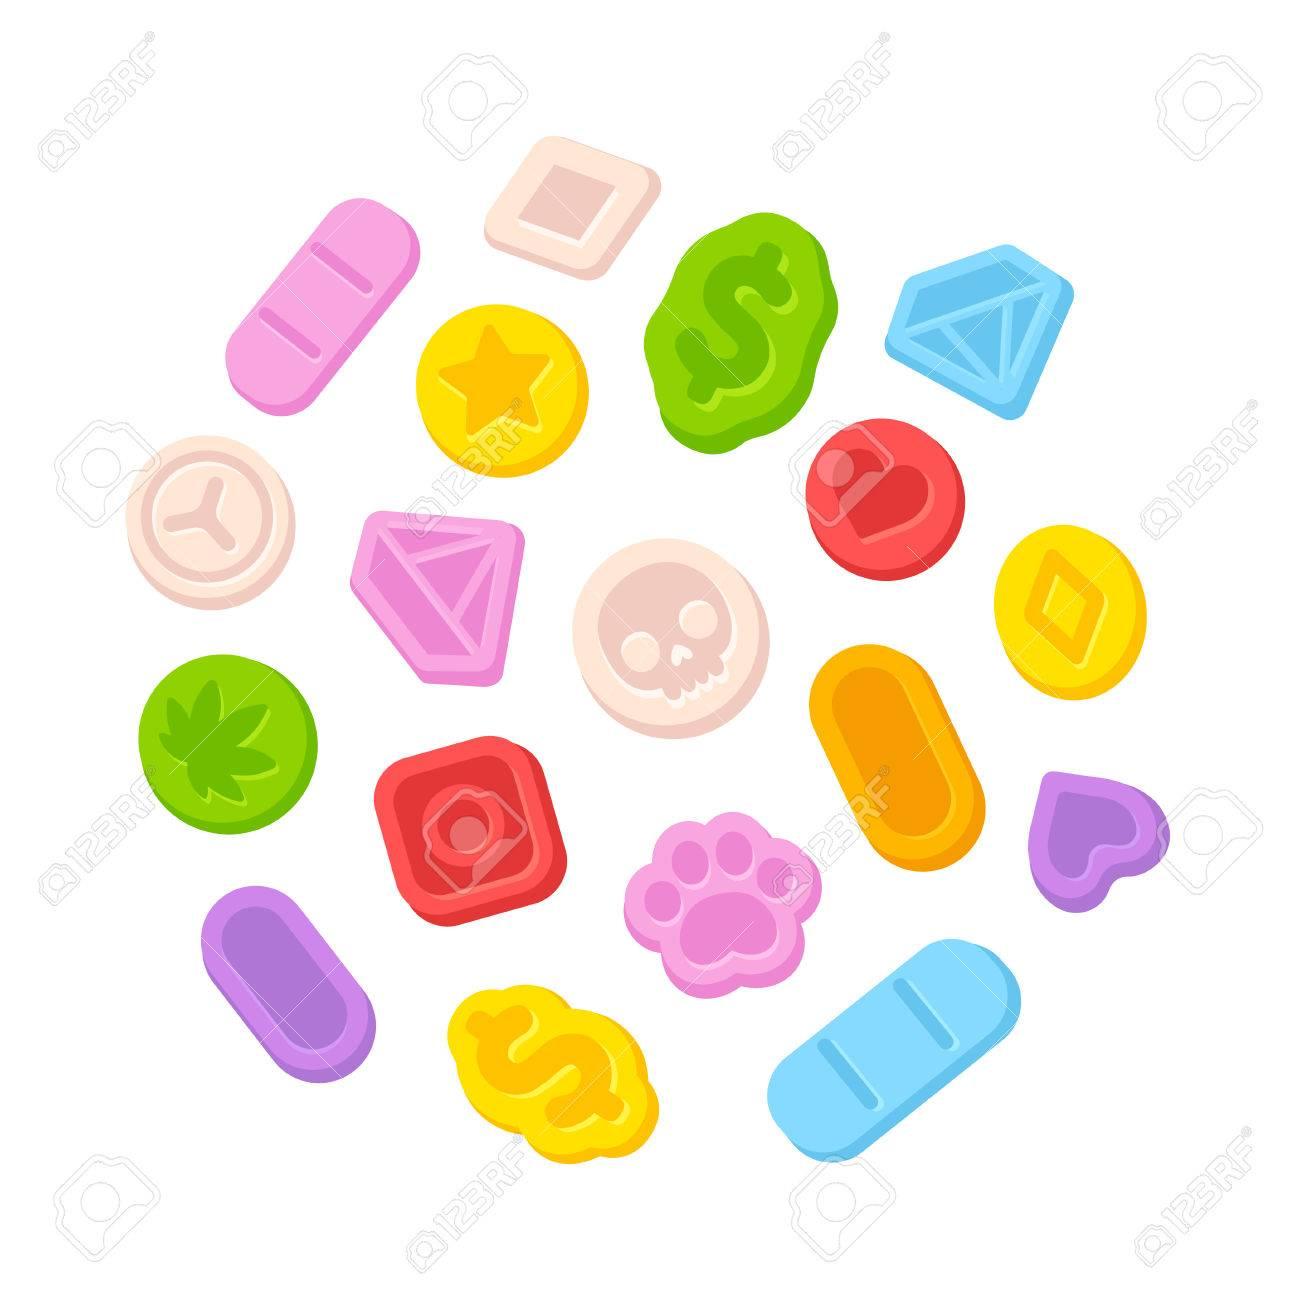 Bright cartoon ecstasy MDMA pills isolated on white background